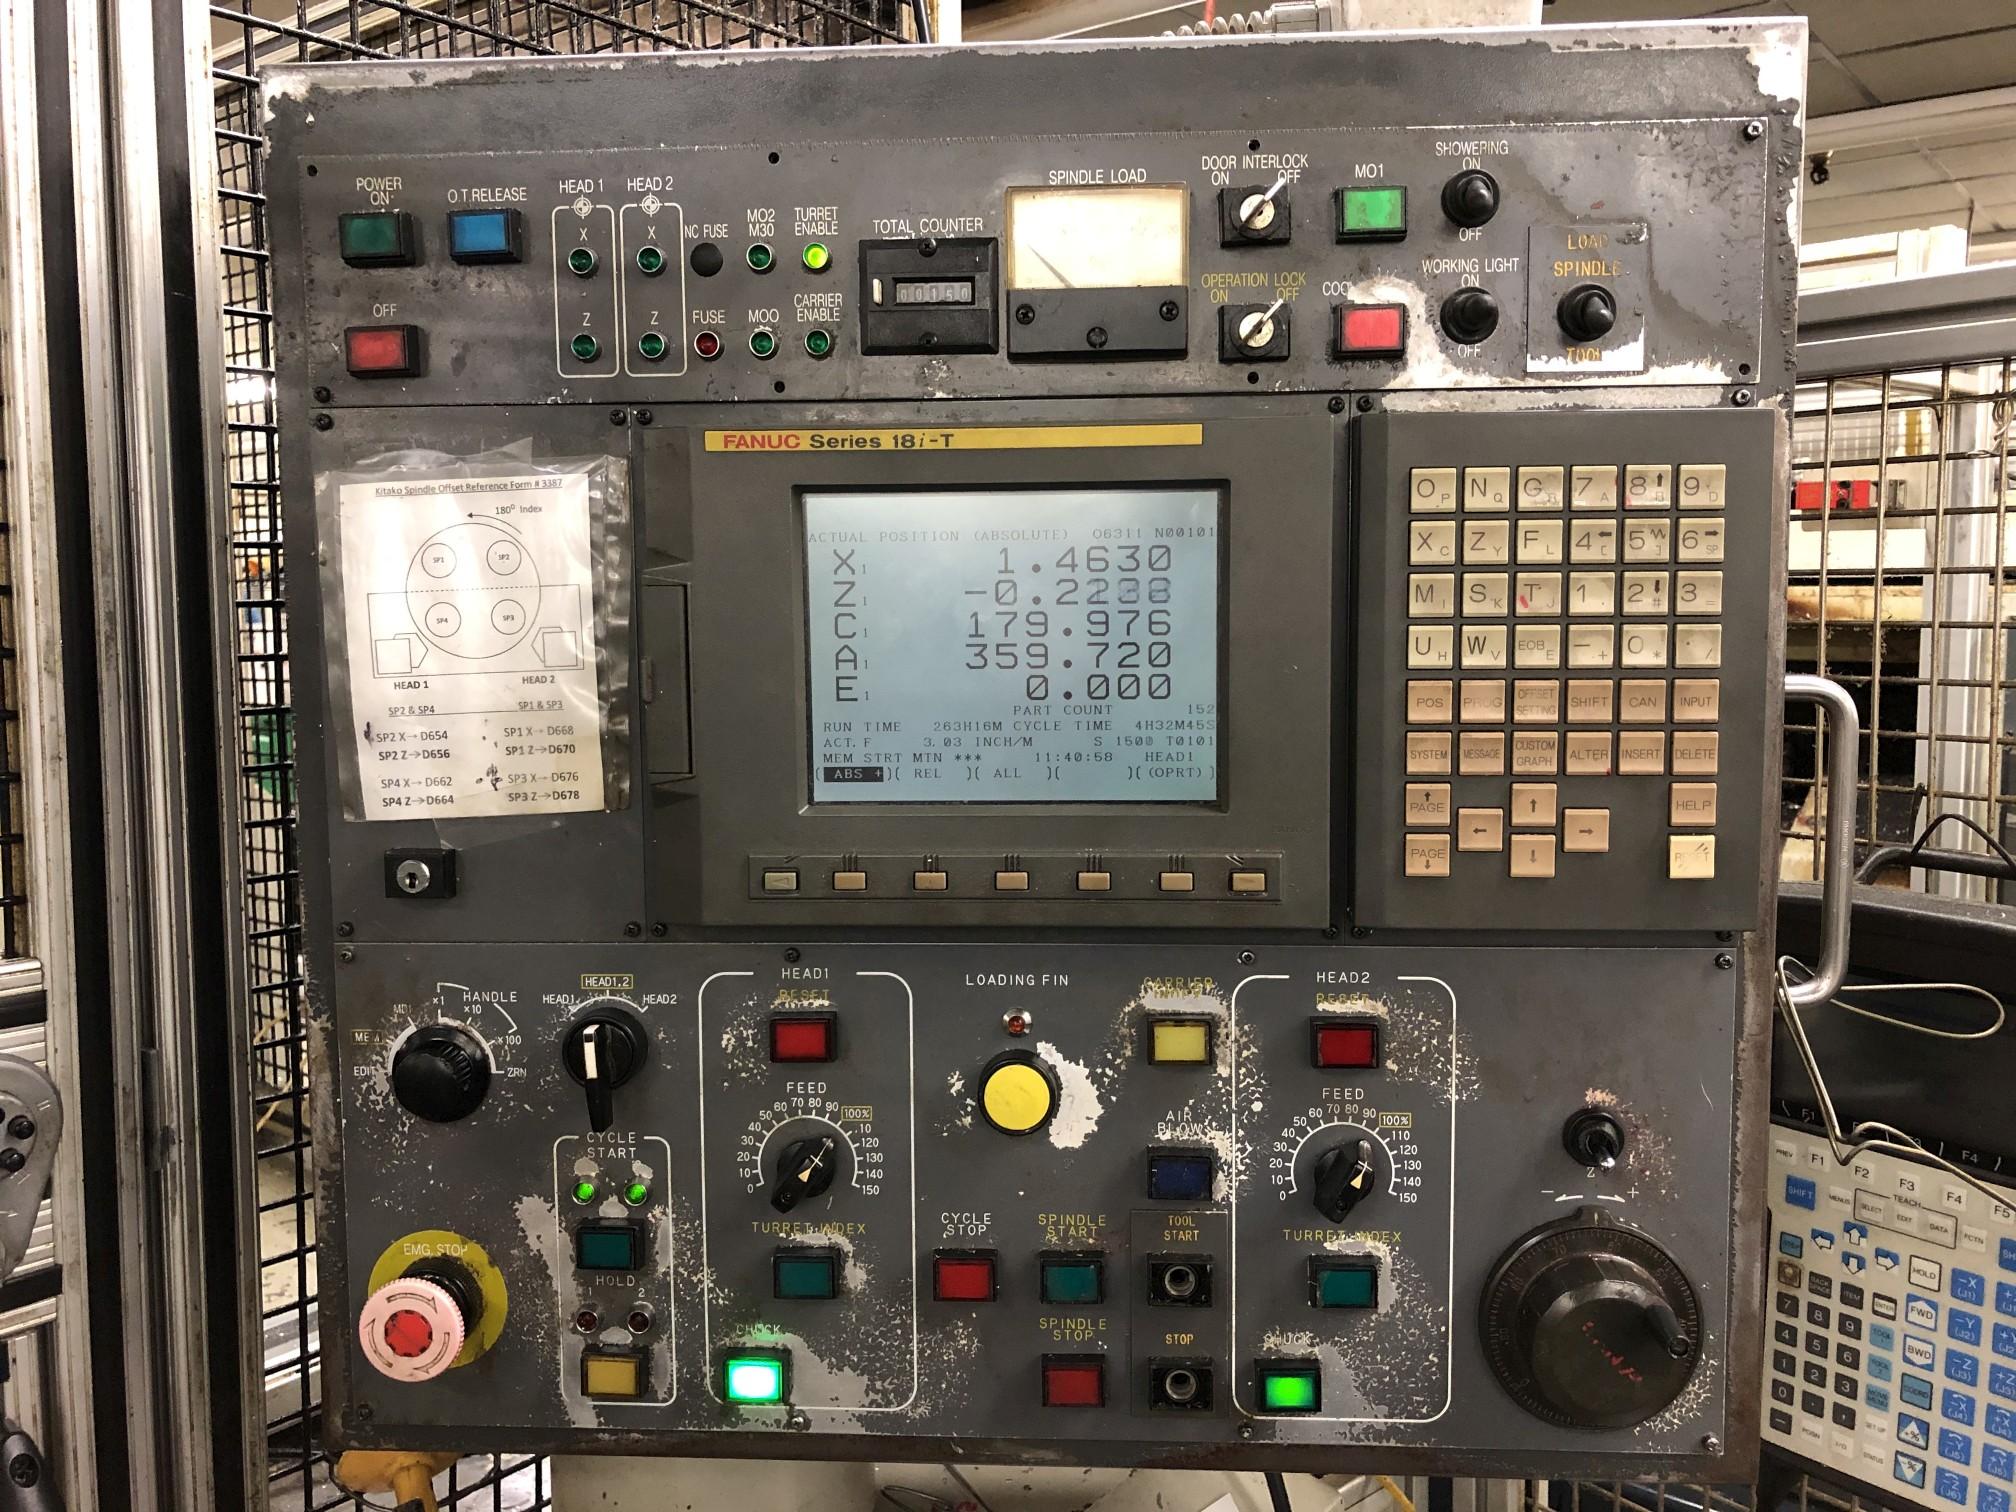 1999 Kitako MT4-200M Multi-Spindle CNC Turning Mill - Image 4 of 15